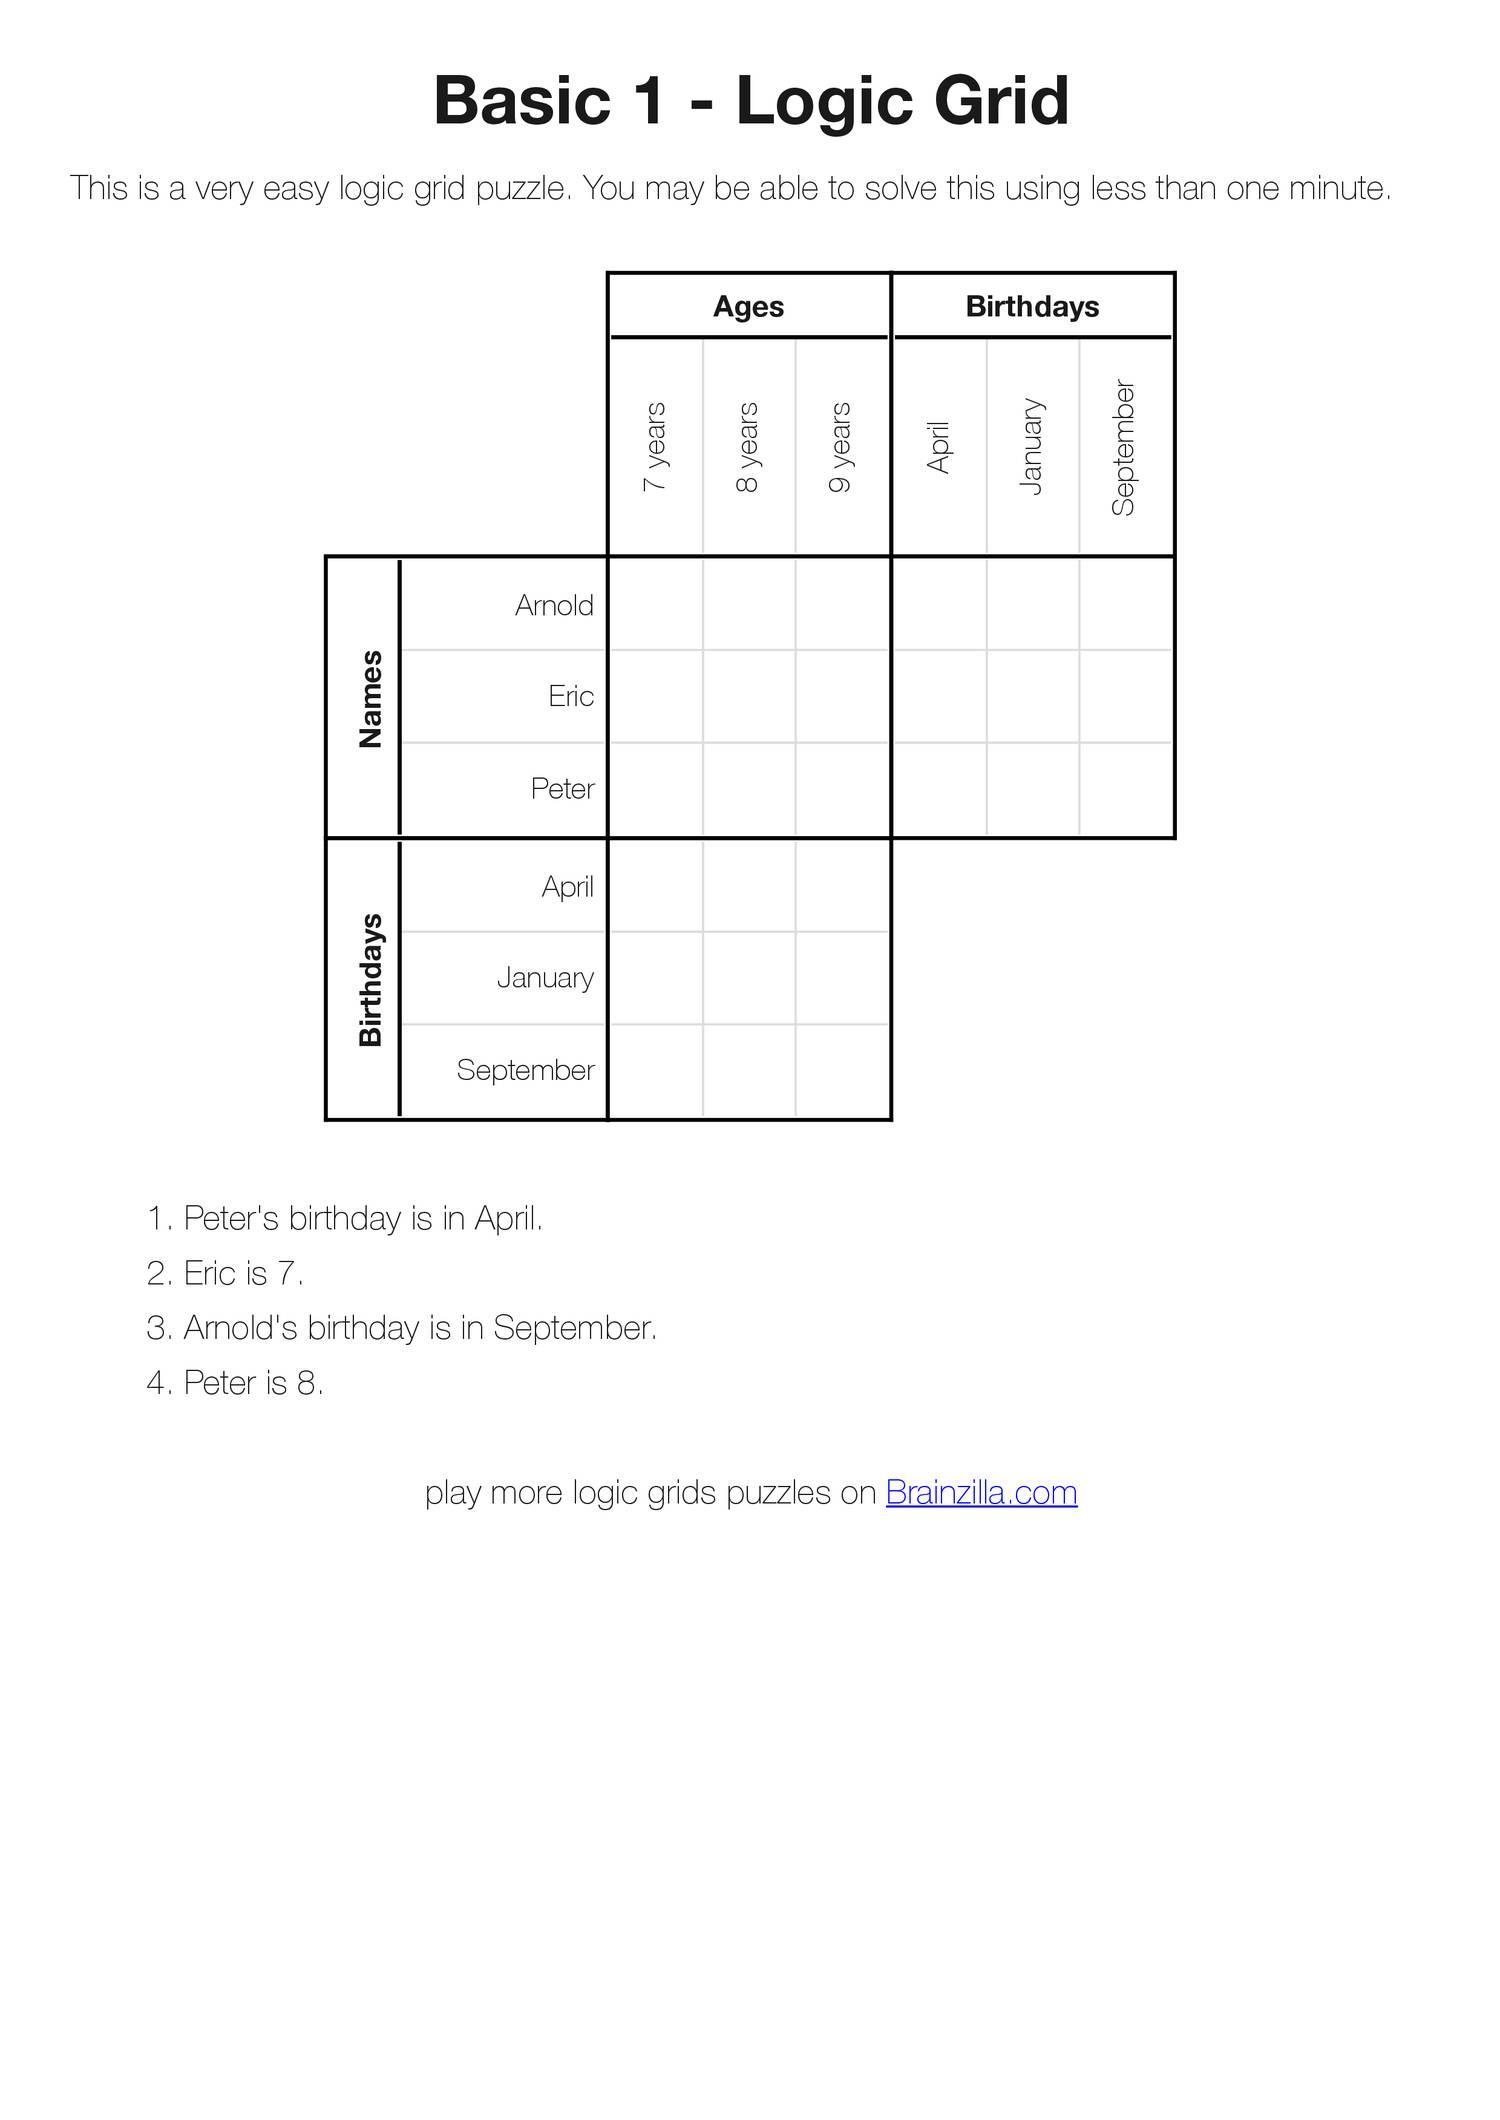 Printable Logic Grid Puzzles (Brainzilla).pdf | Docdroid - Printable Deduction Puzzles